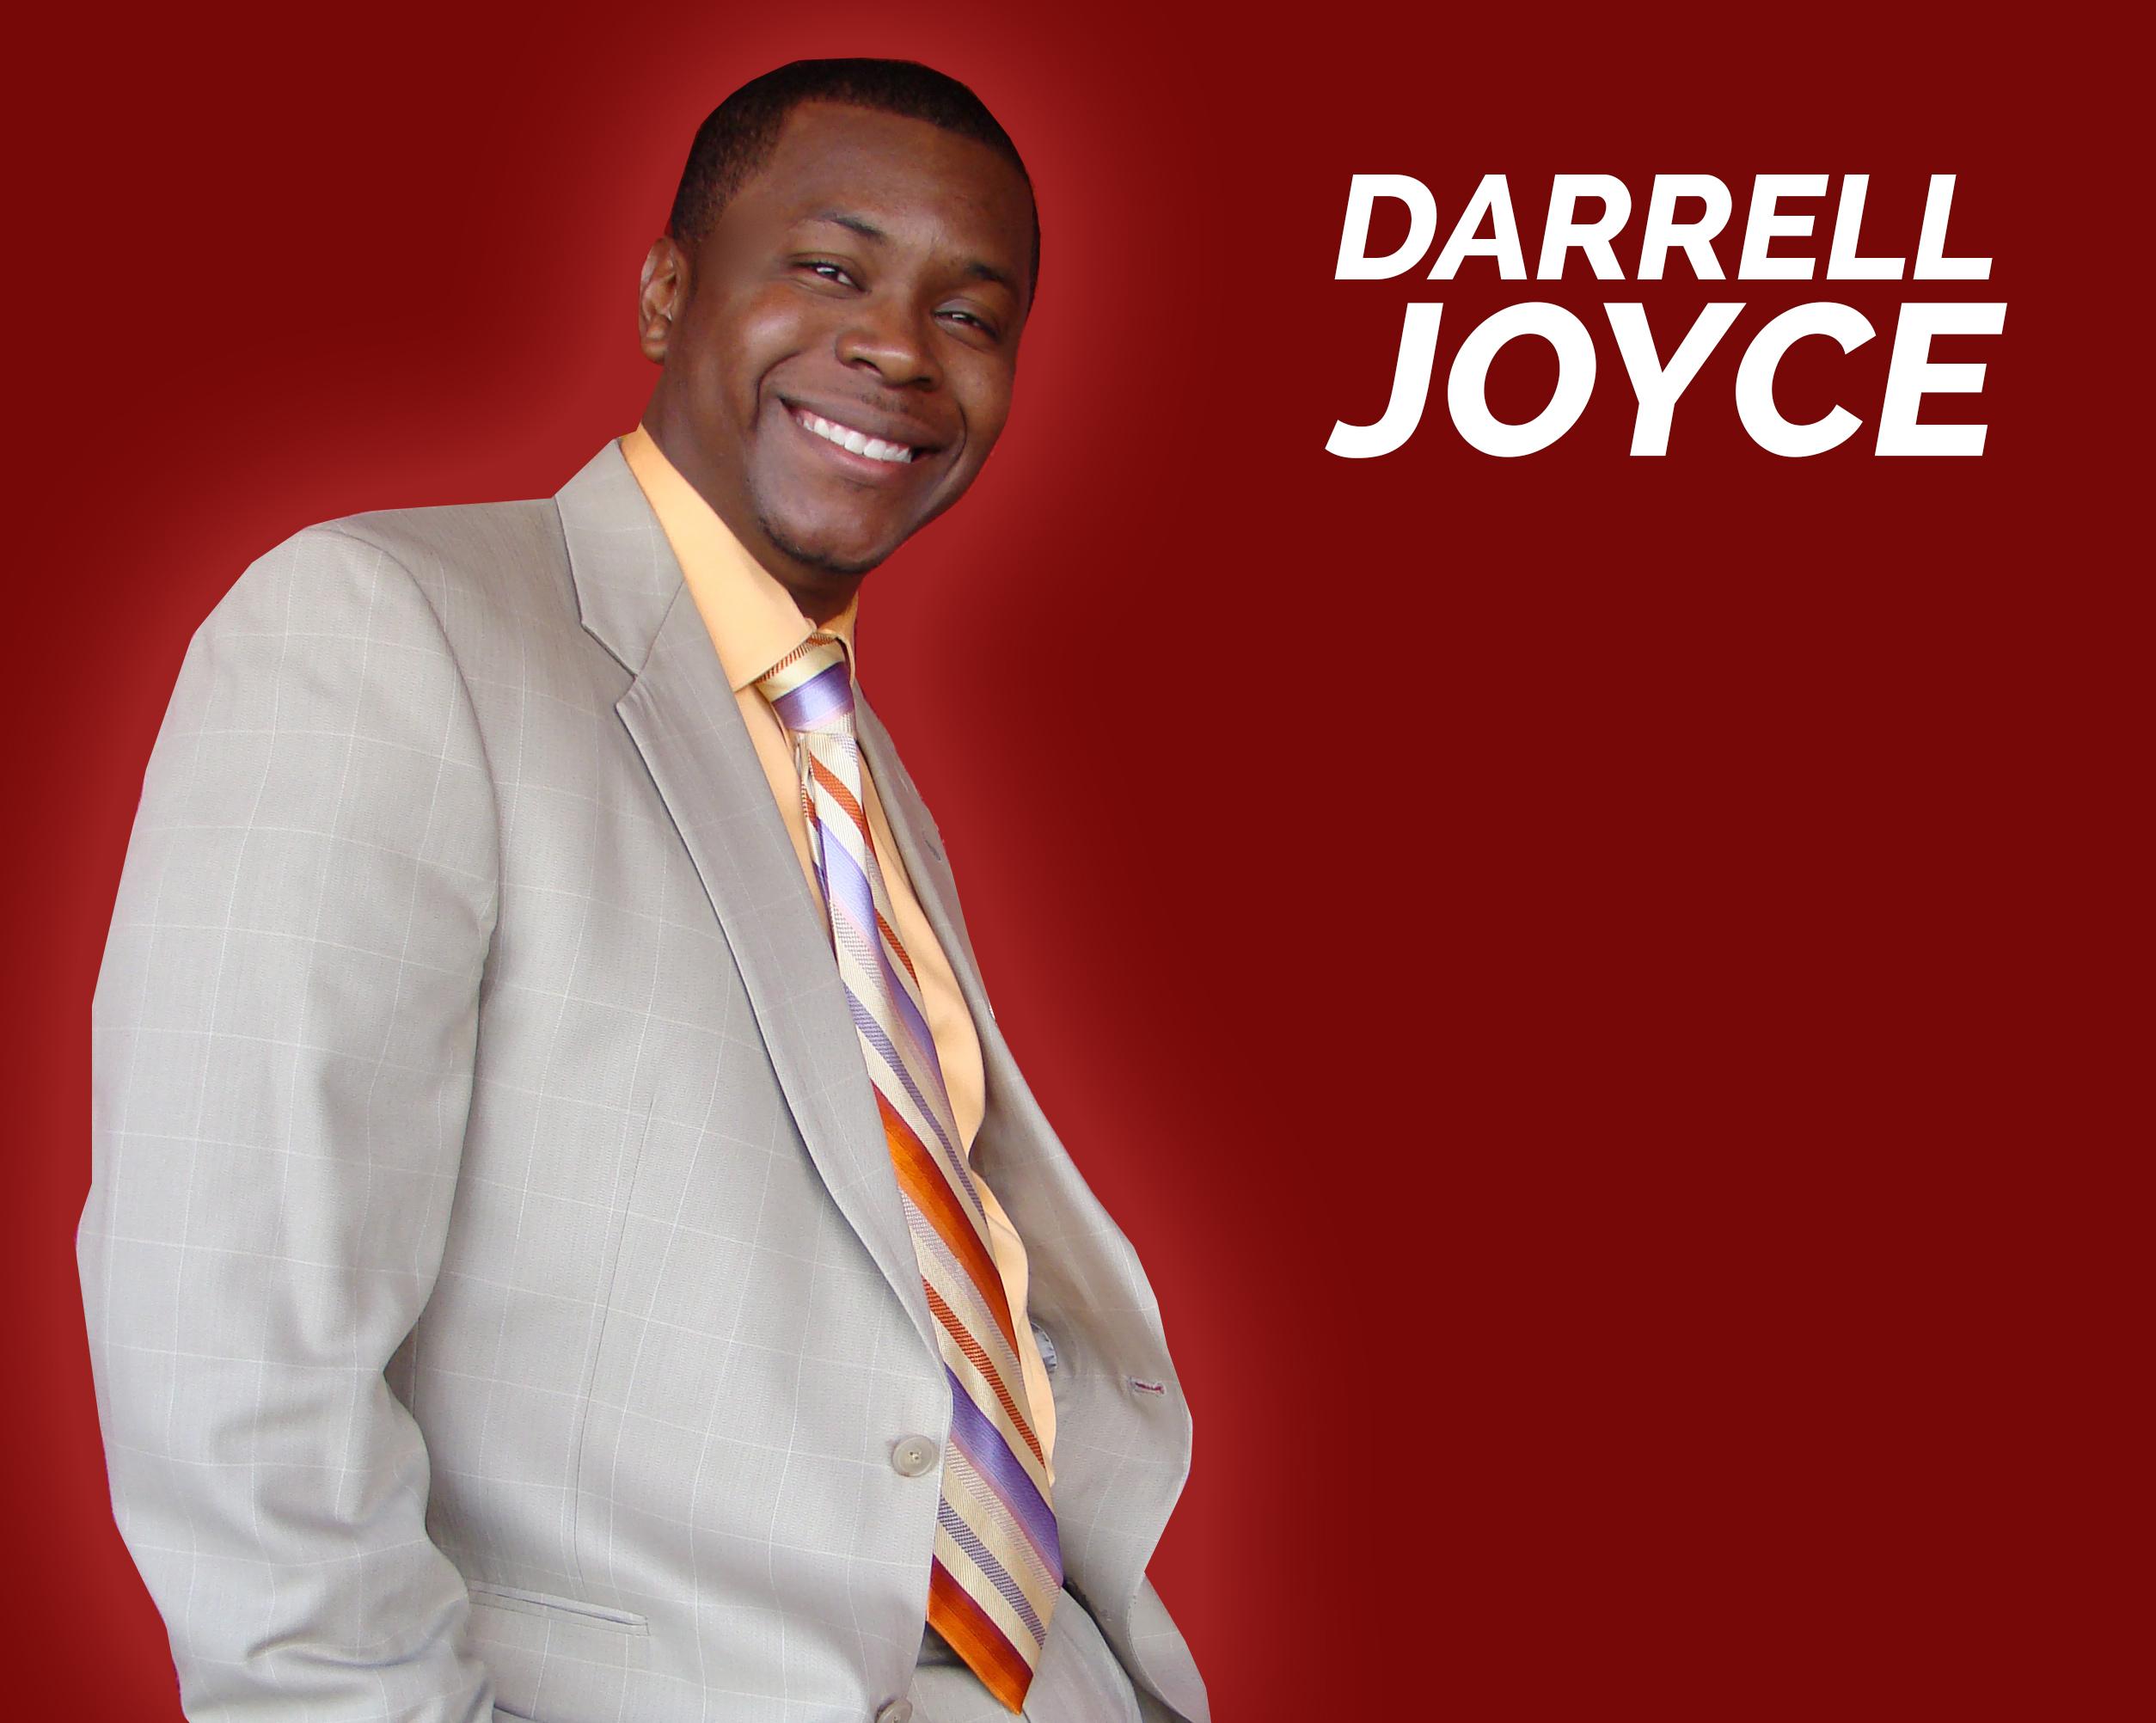 darrell-joyce-2018